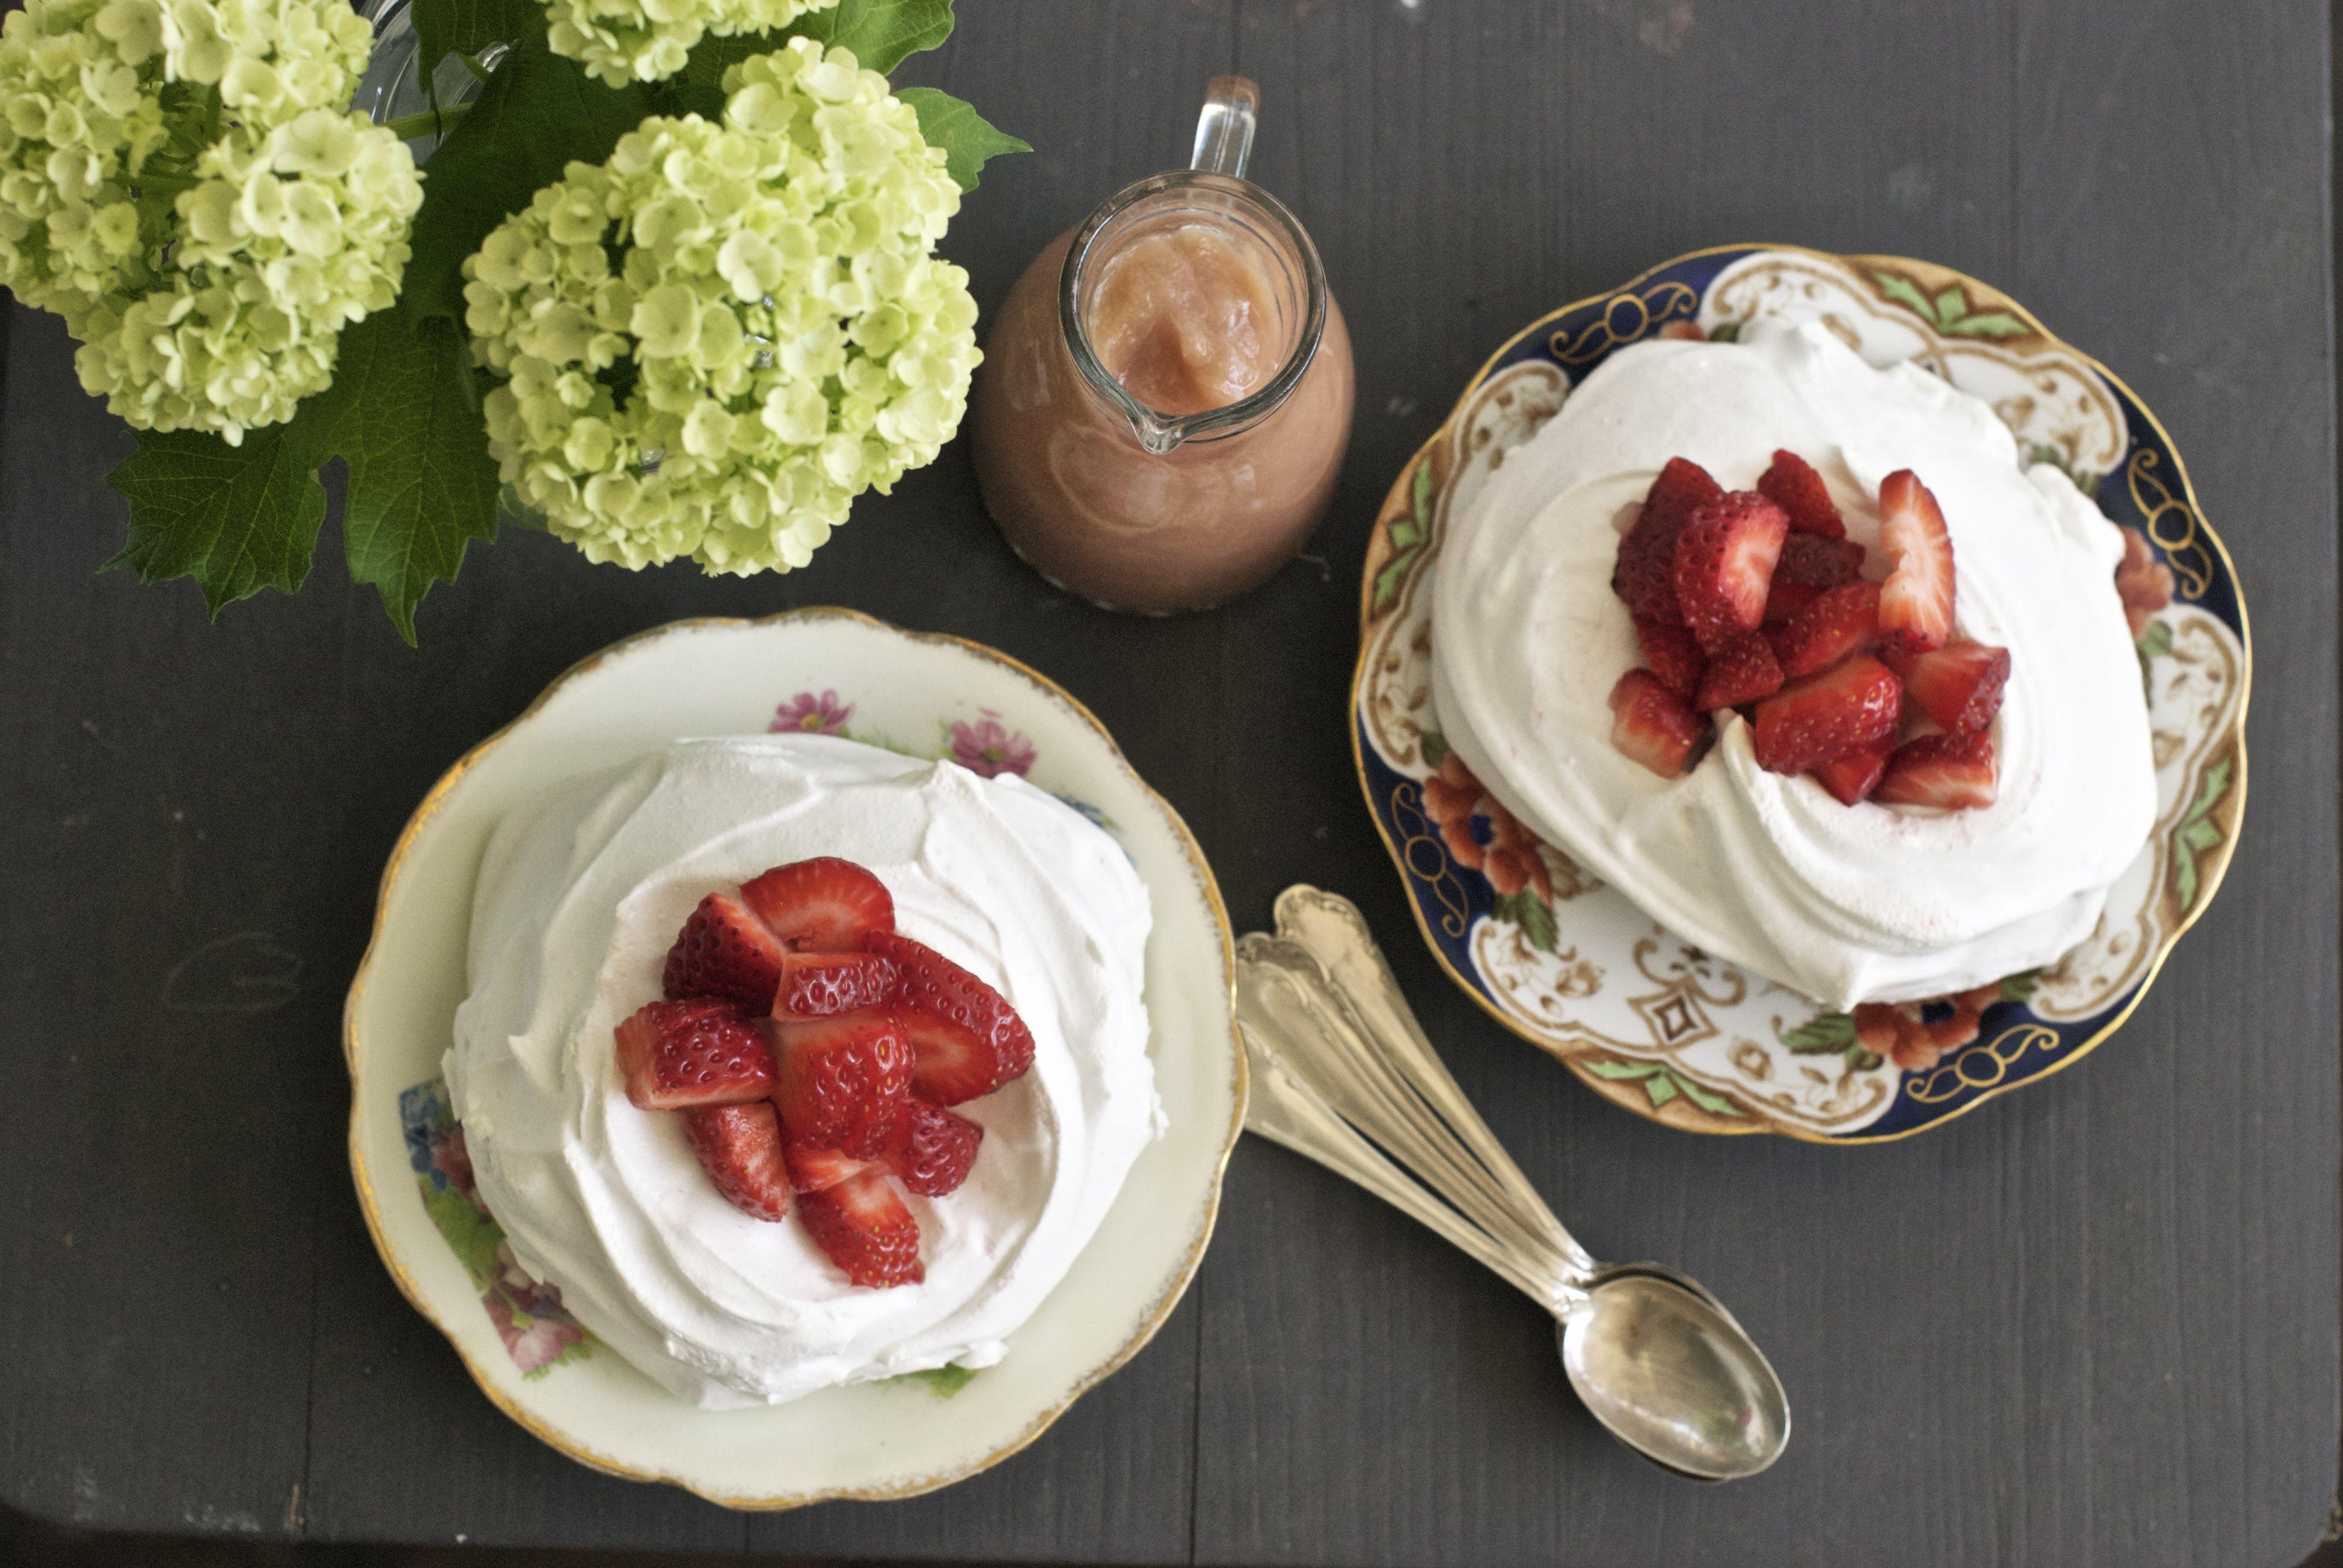 Strawberry pavlova with rhubarb coulis